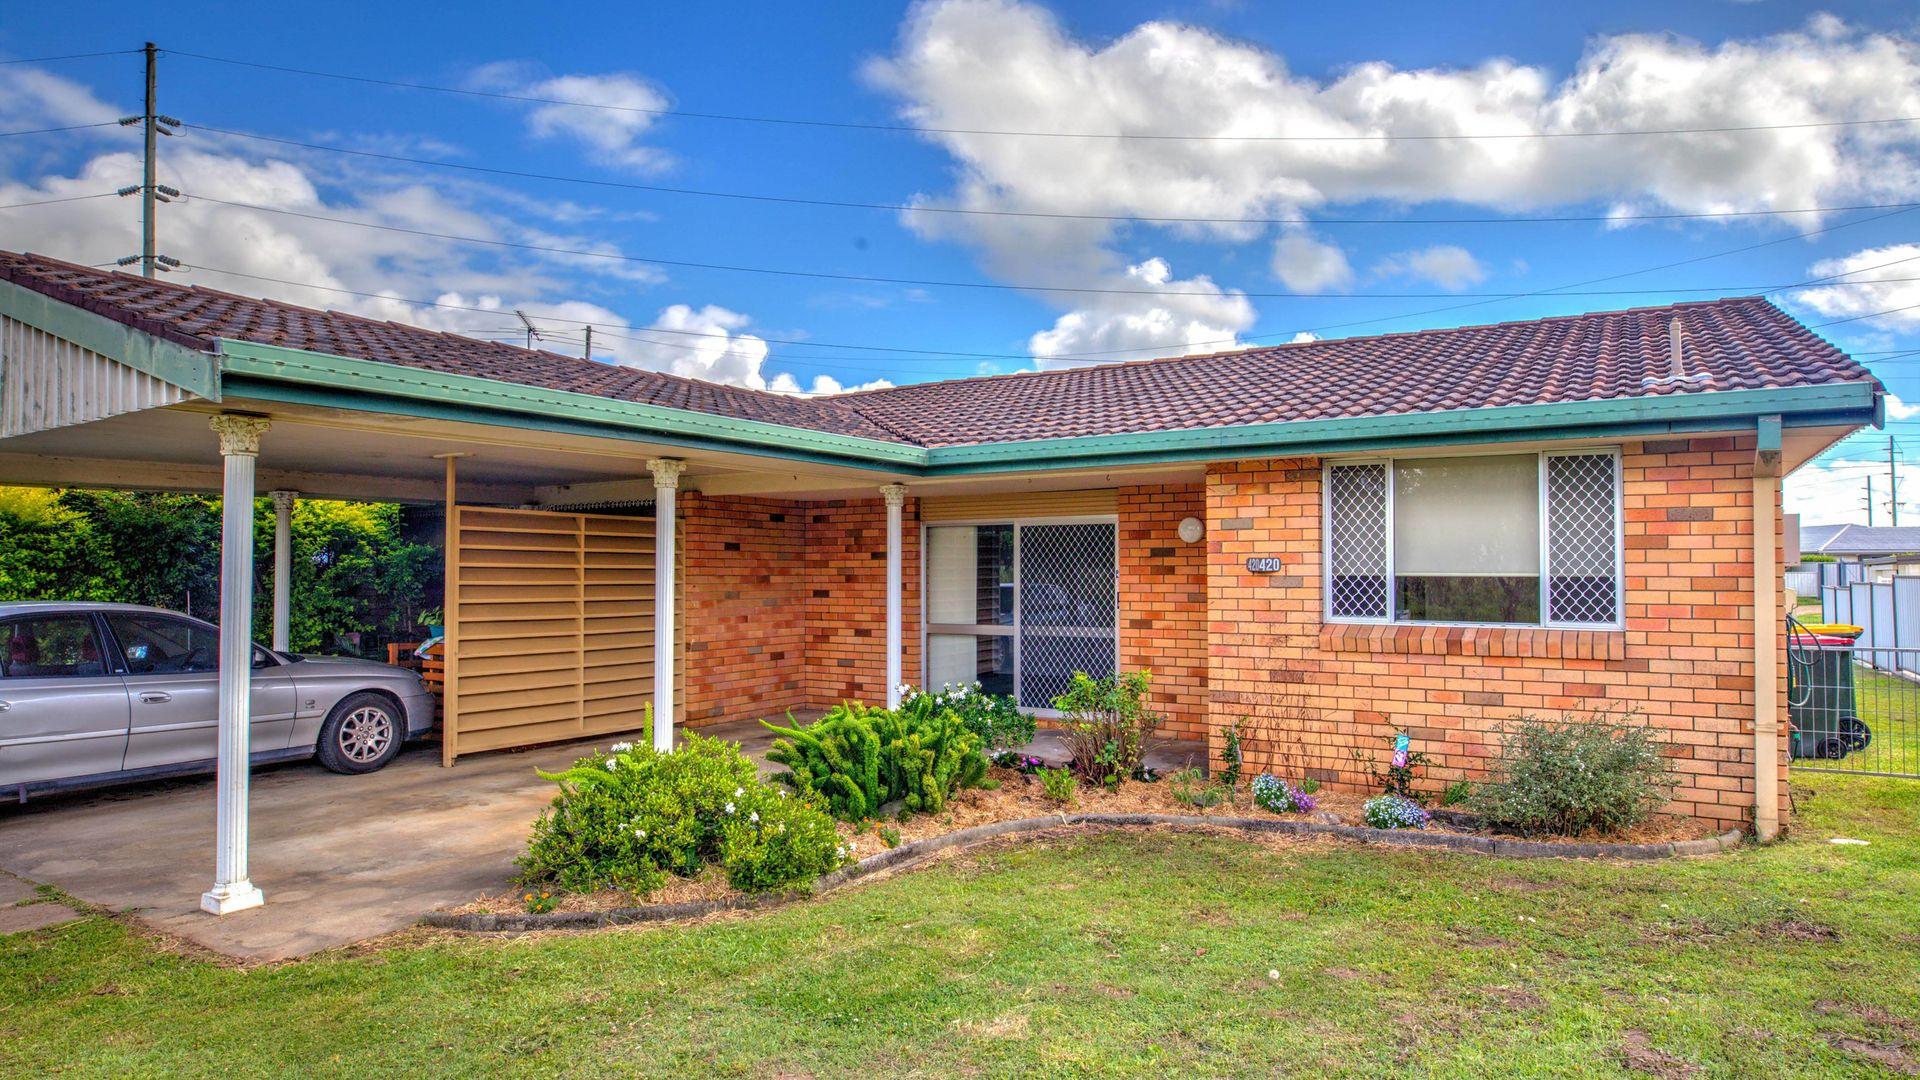 1/420 Dobie Street, Grafton NSW 2460, Image 1